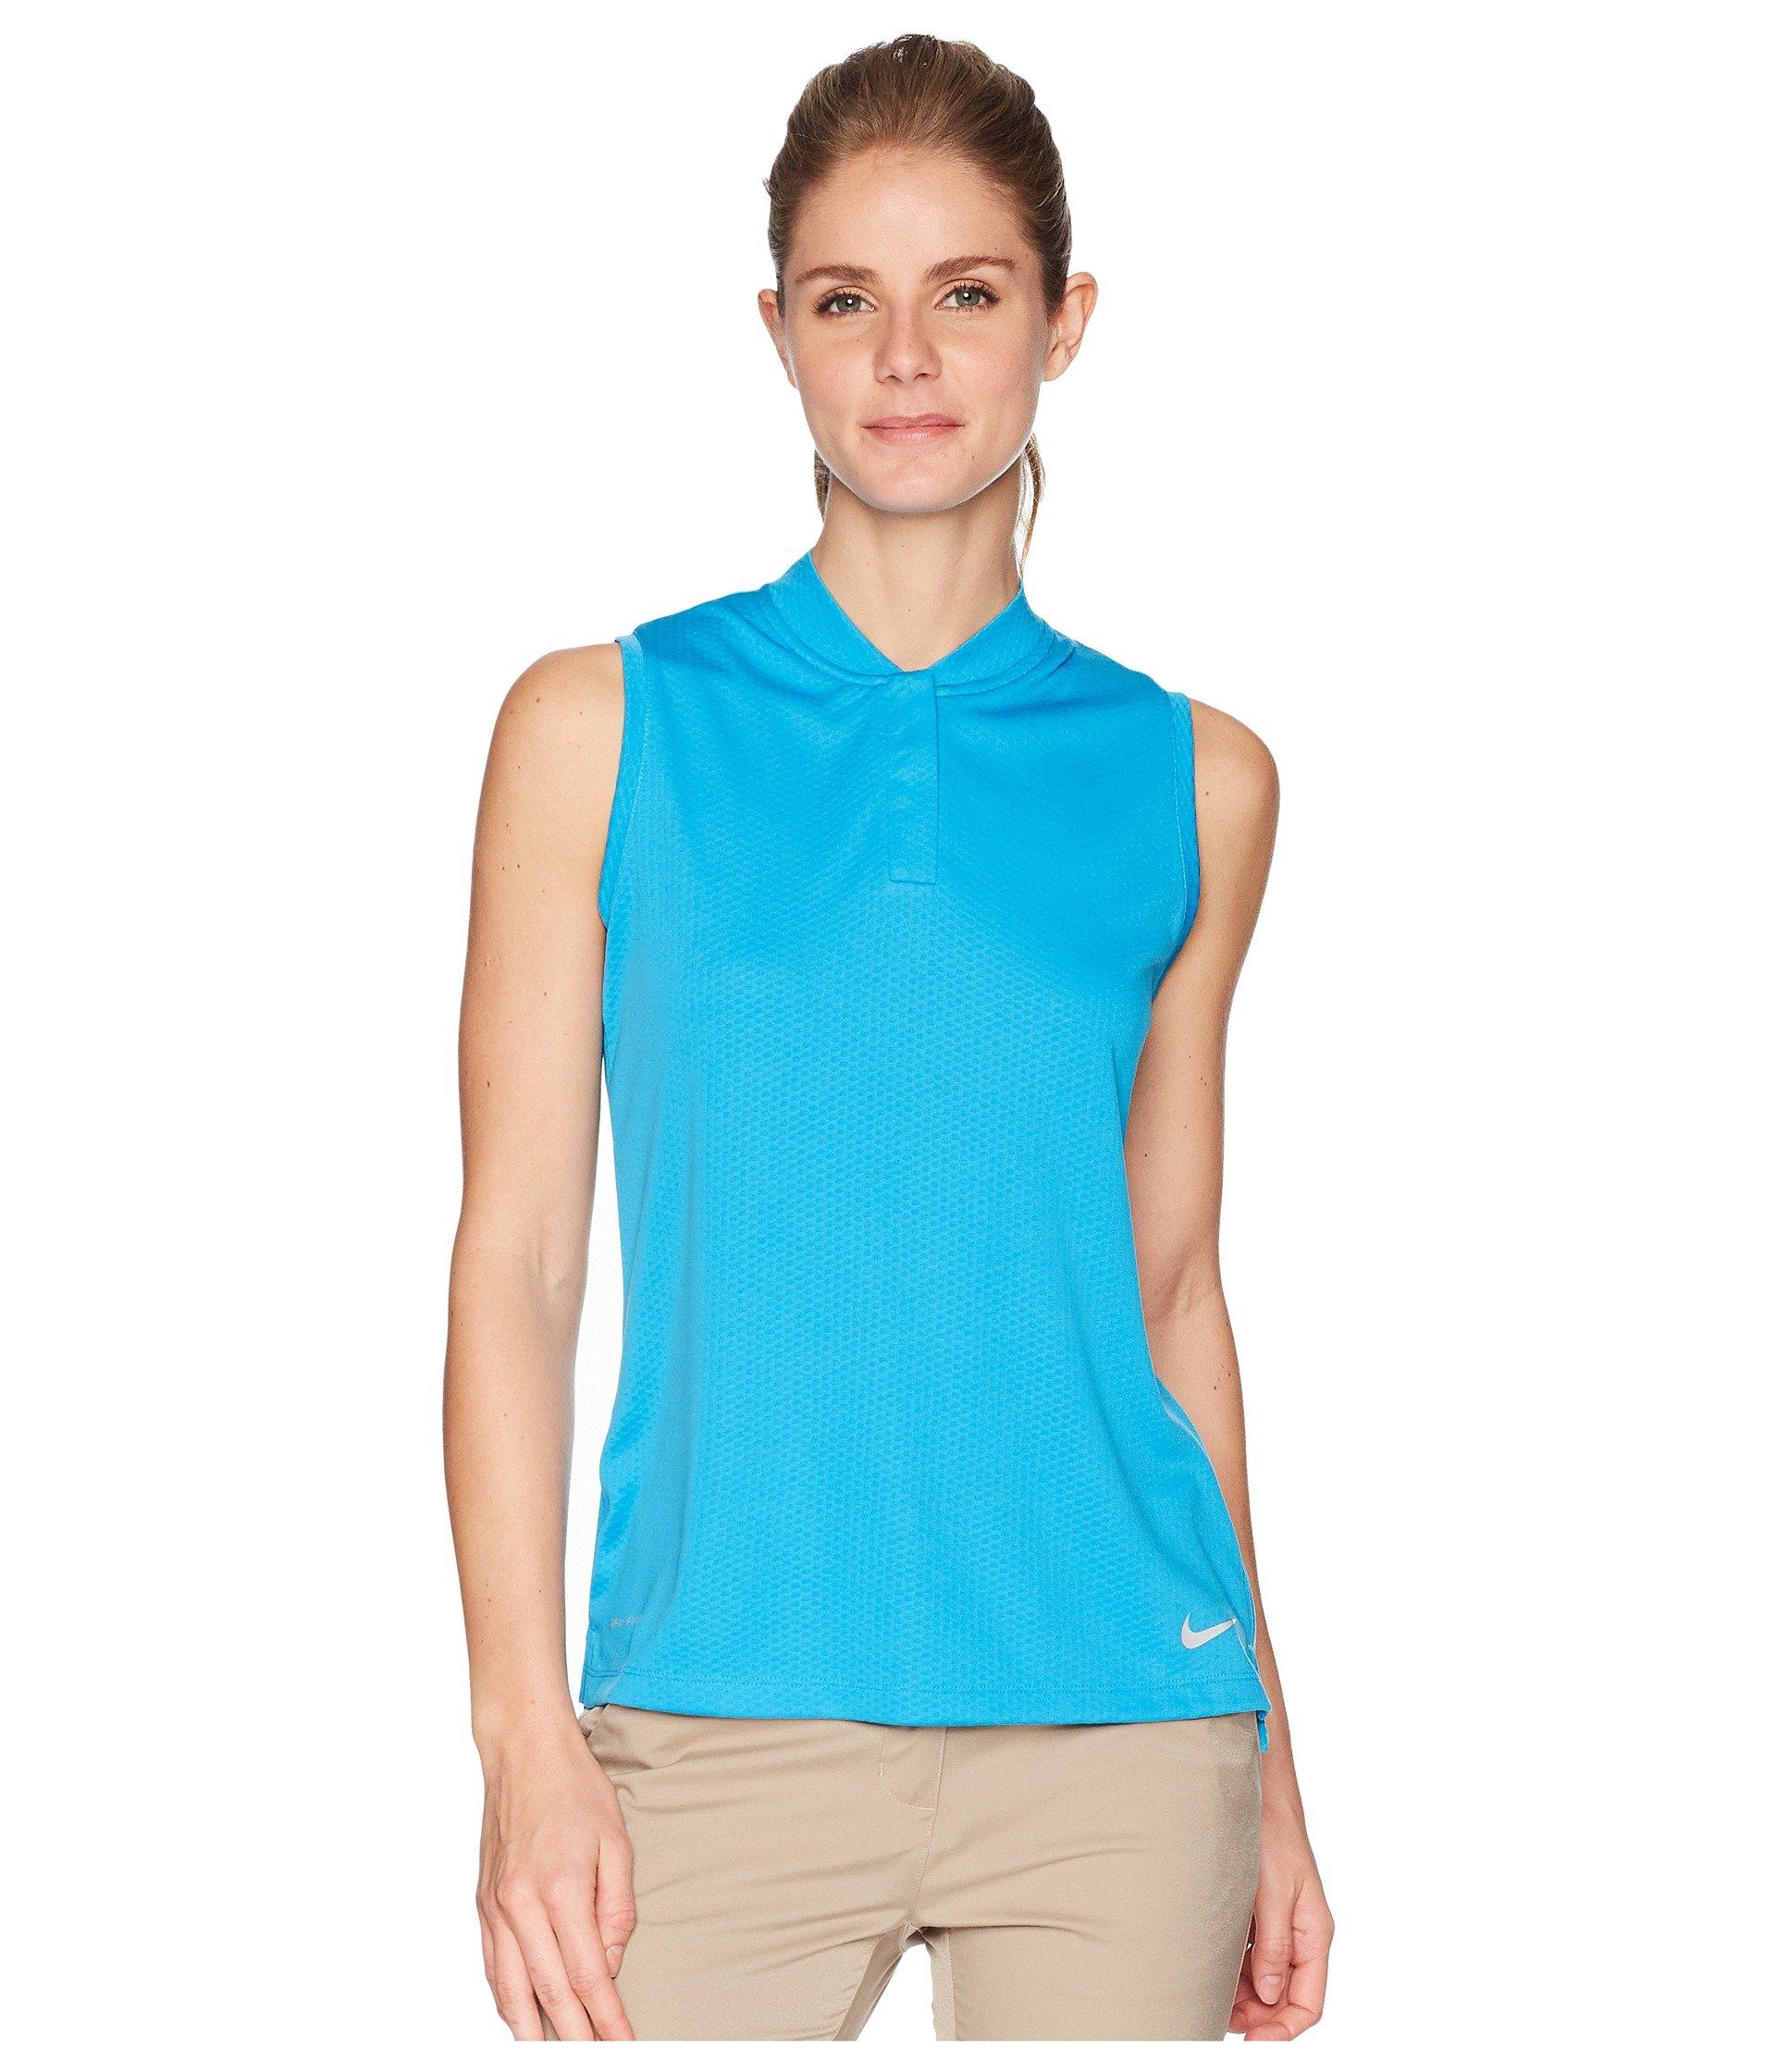 Nike Dri Fit Sleeveless Blade Collar Golf Polo 2018 Women Equator Blue/Flat Silver Medium by Nike